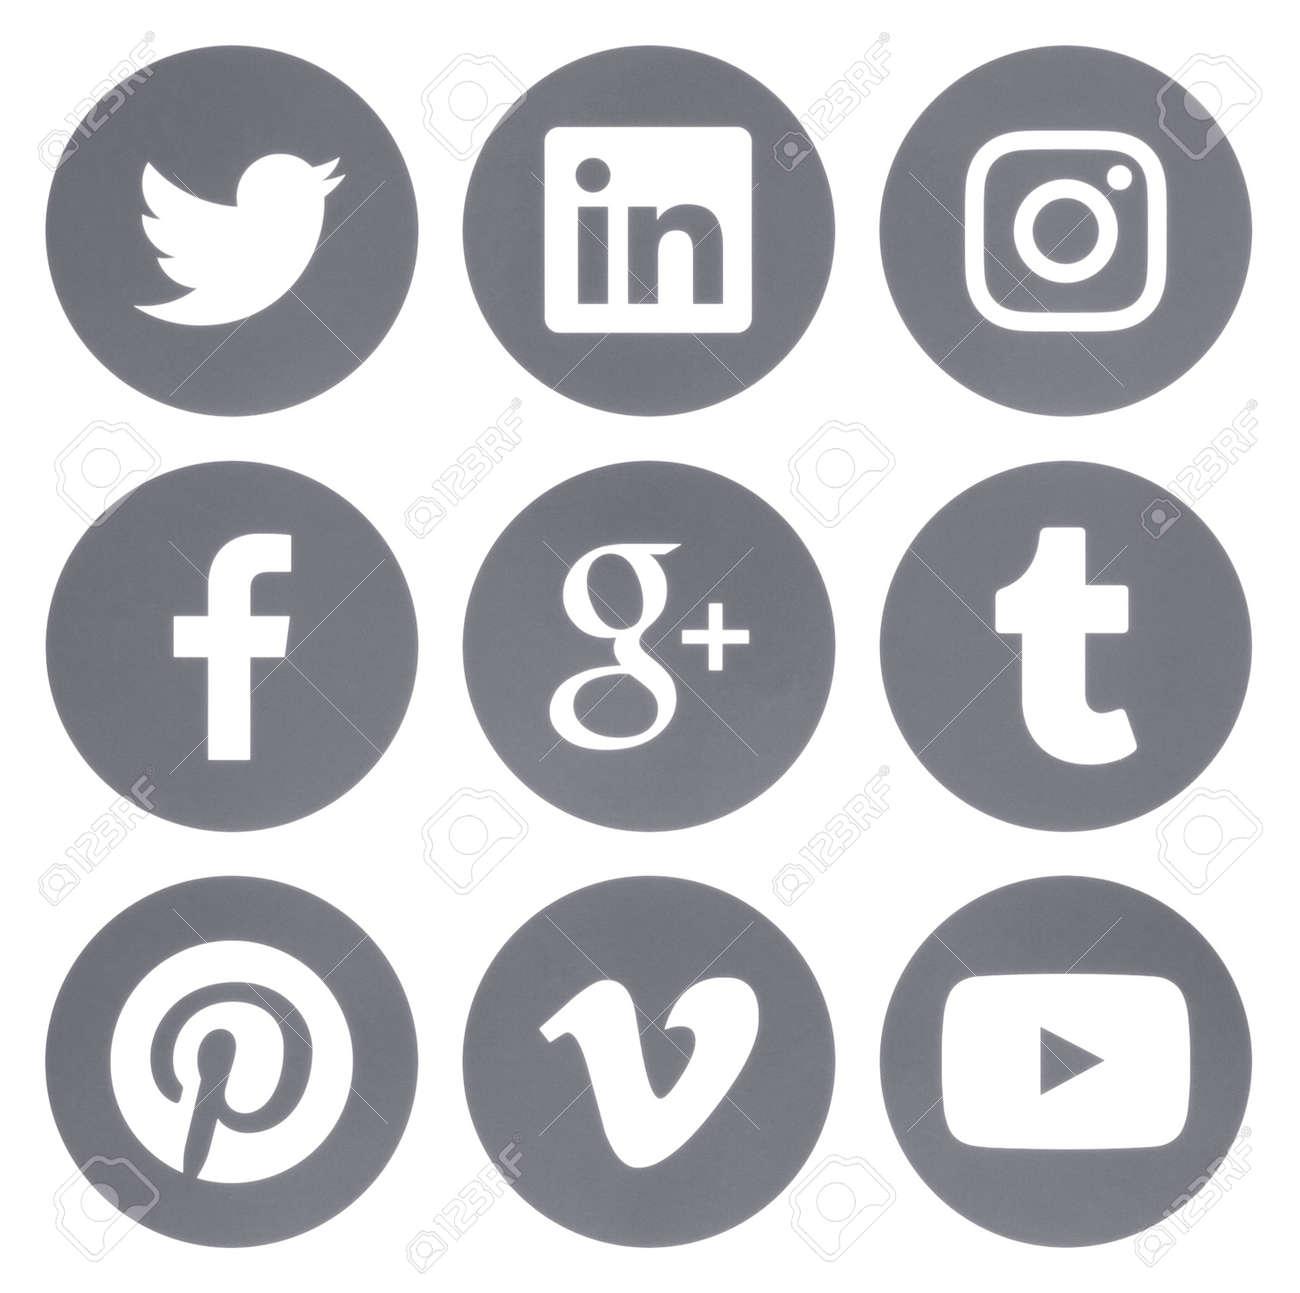 Kiev, Ukraine - Febraury 28, 2017: Collection of round popular social media gray logos printed on paper: Facebook, Twitter, Google Plus, Instagram, Pinterest, LinkedIn, Vimeo, Tumblr and Youtube - 74932833